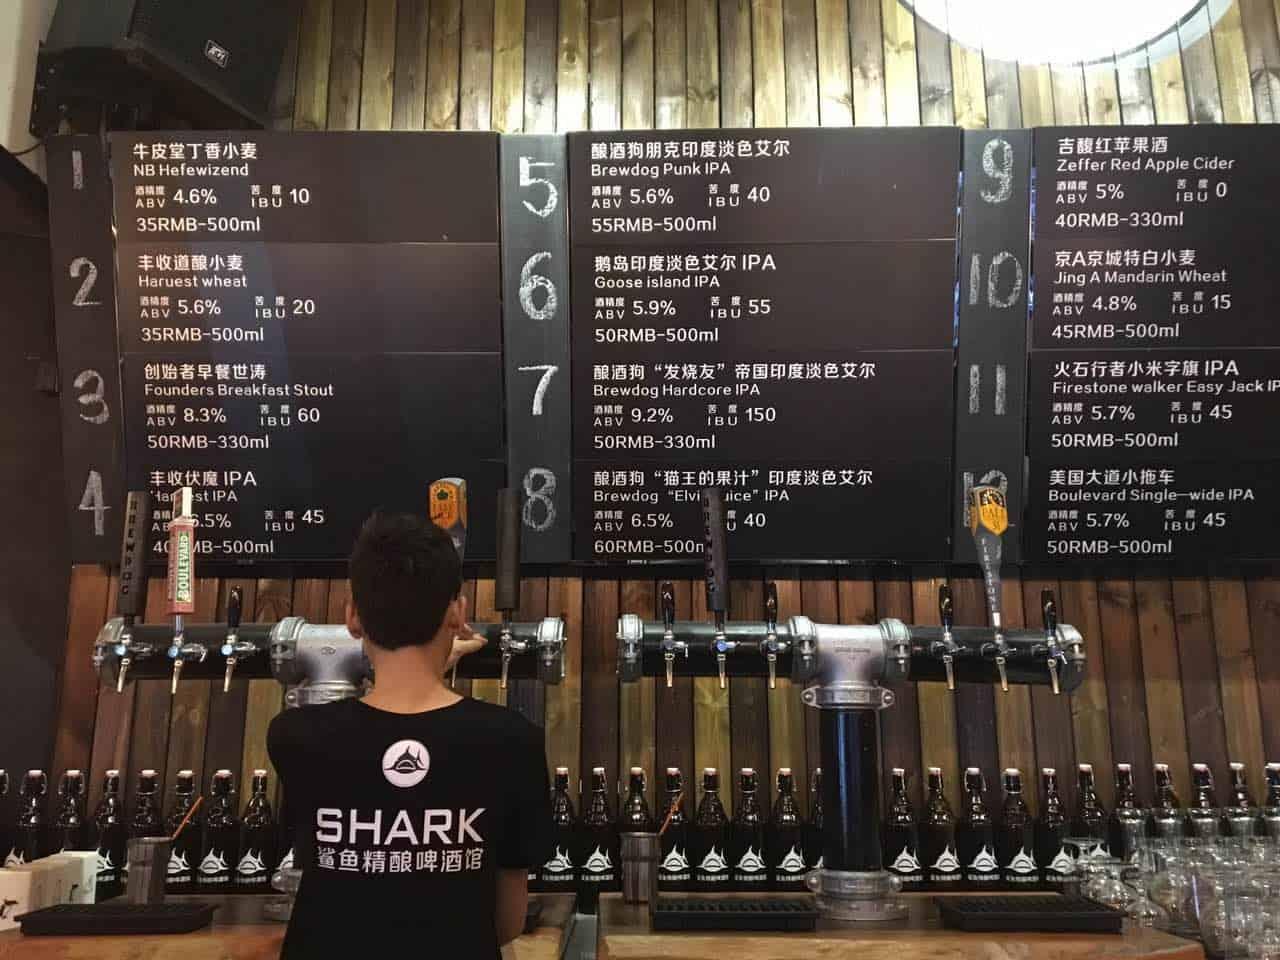 Shark Craft Beer Bar Chengdu